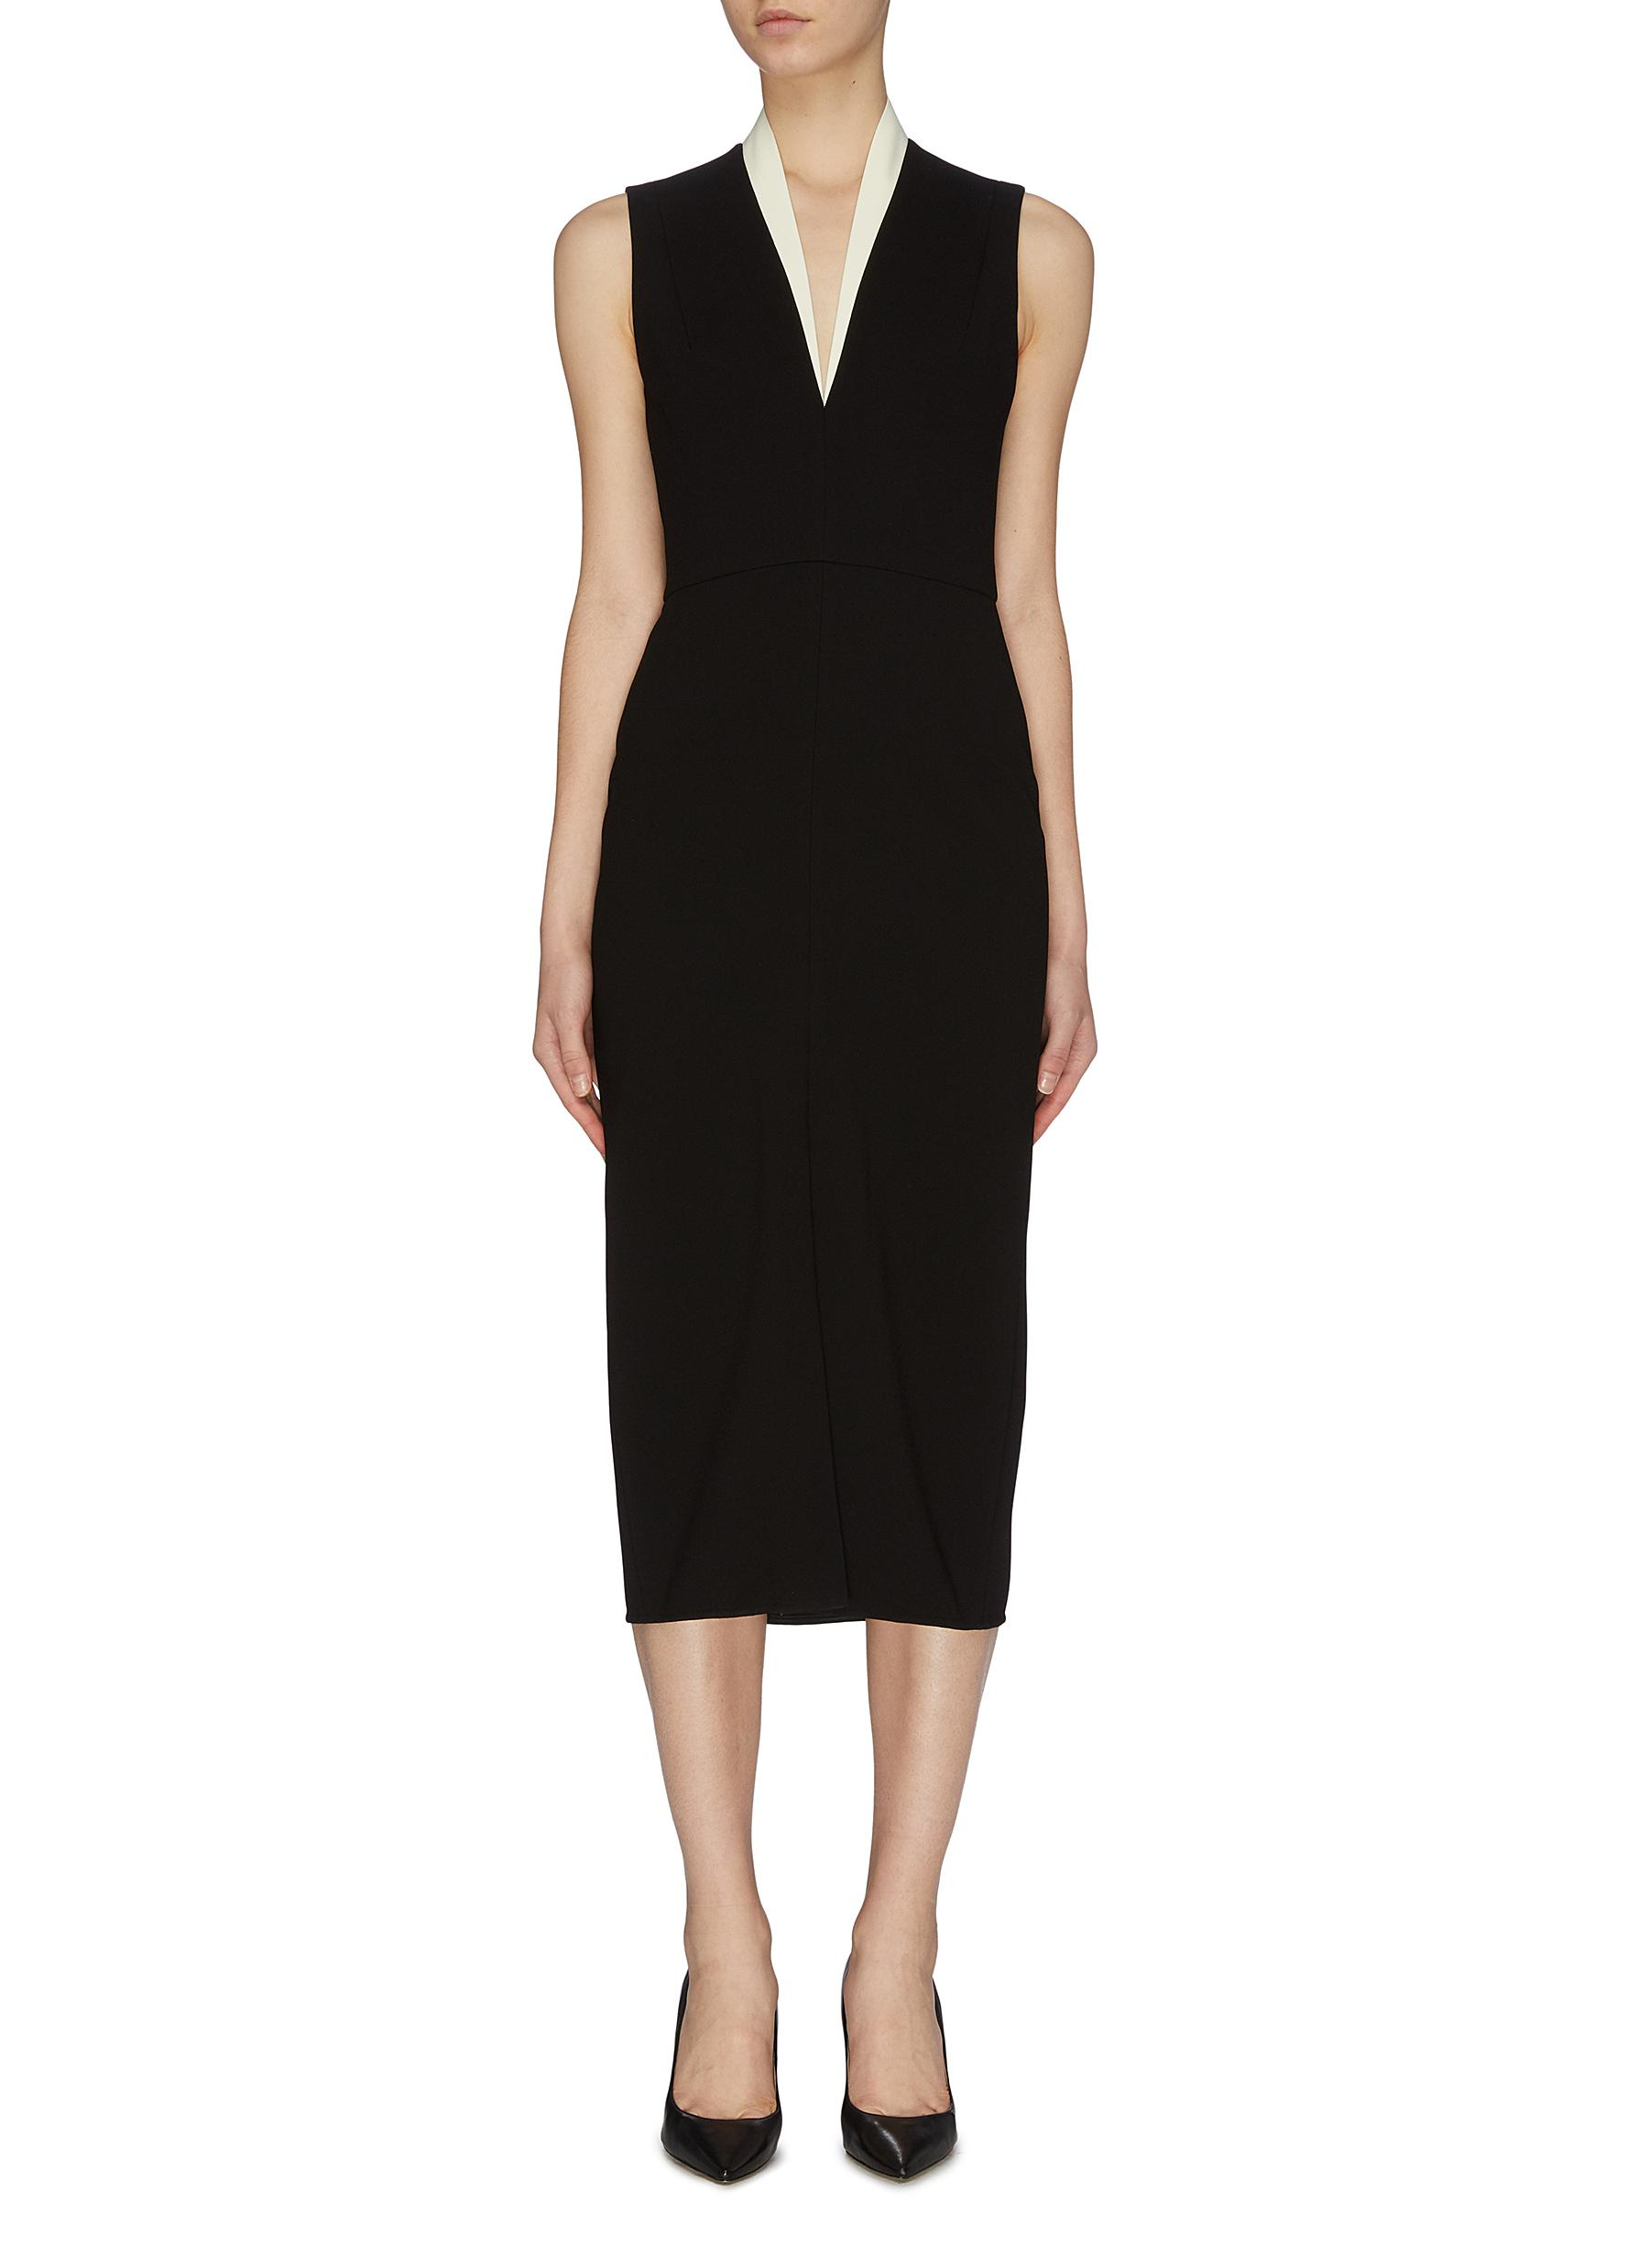 Buy Victoria Beckham Dresses V neck drape sleeveless dress